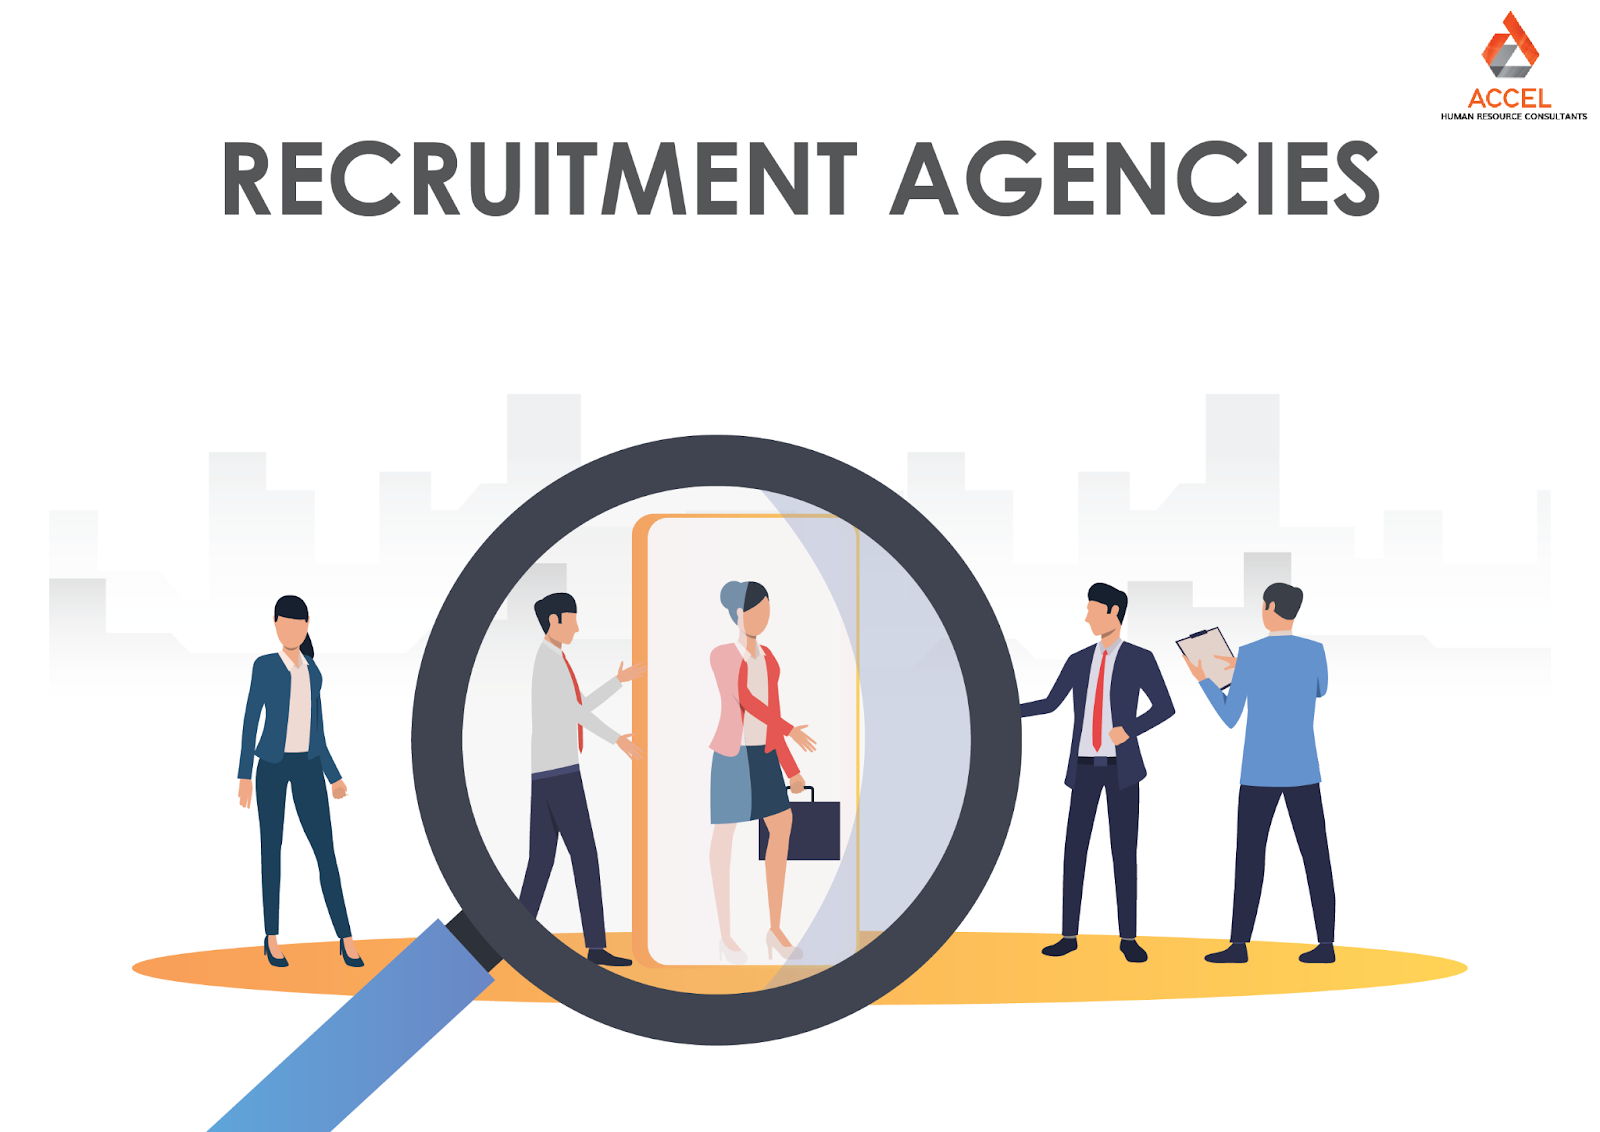 Recruitment agencies in Dubai - 3 huge tips for beginning recruitment agencies